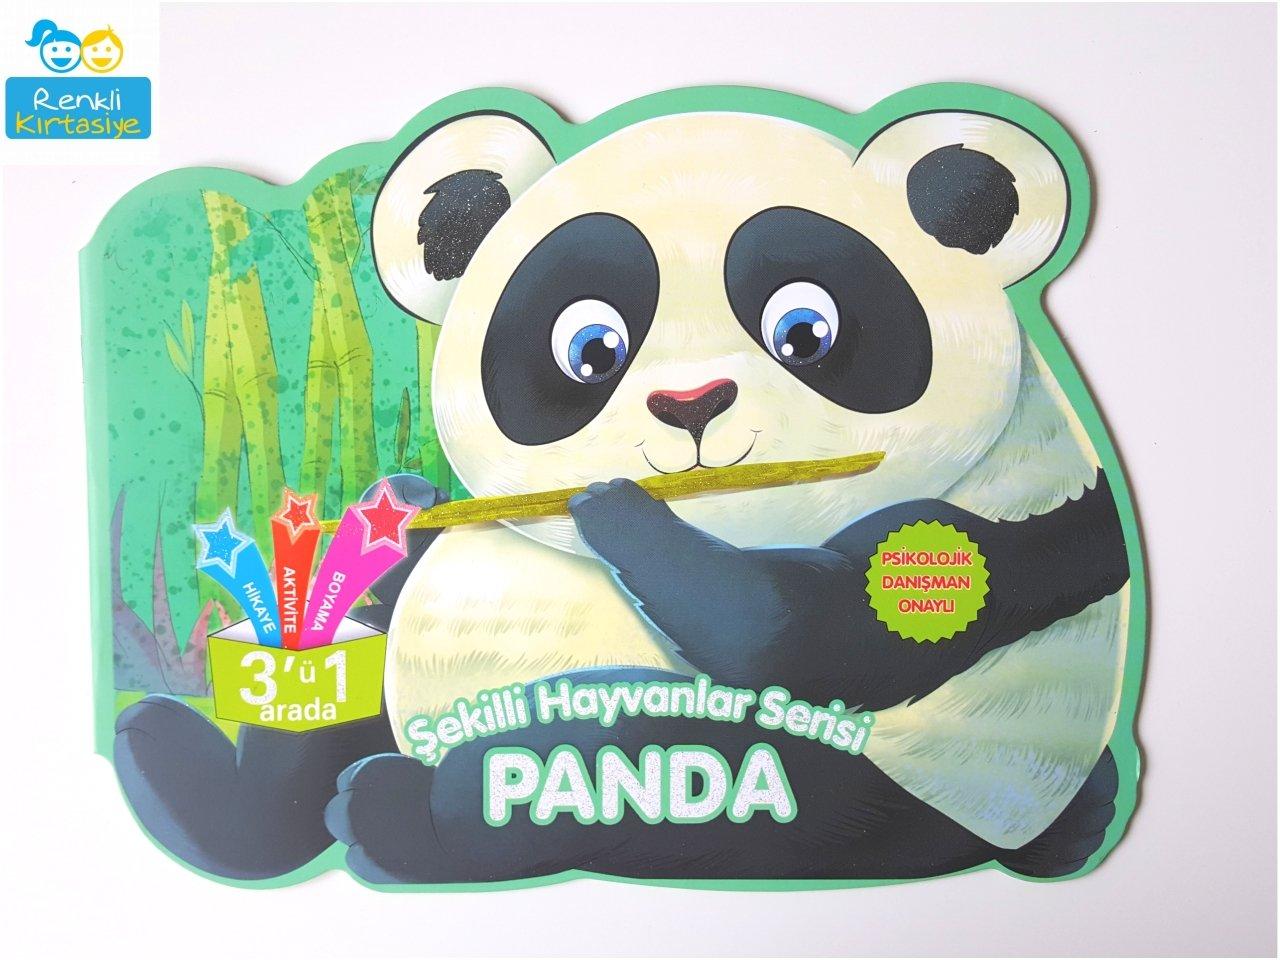 Sekilli Hayvanlar Serisi Panda 3 U 1 Arada Aktivite Kitabi